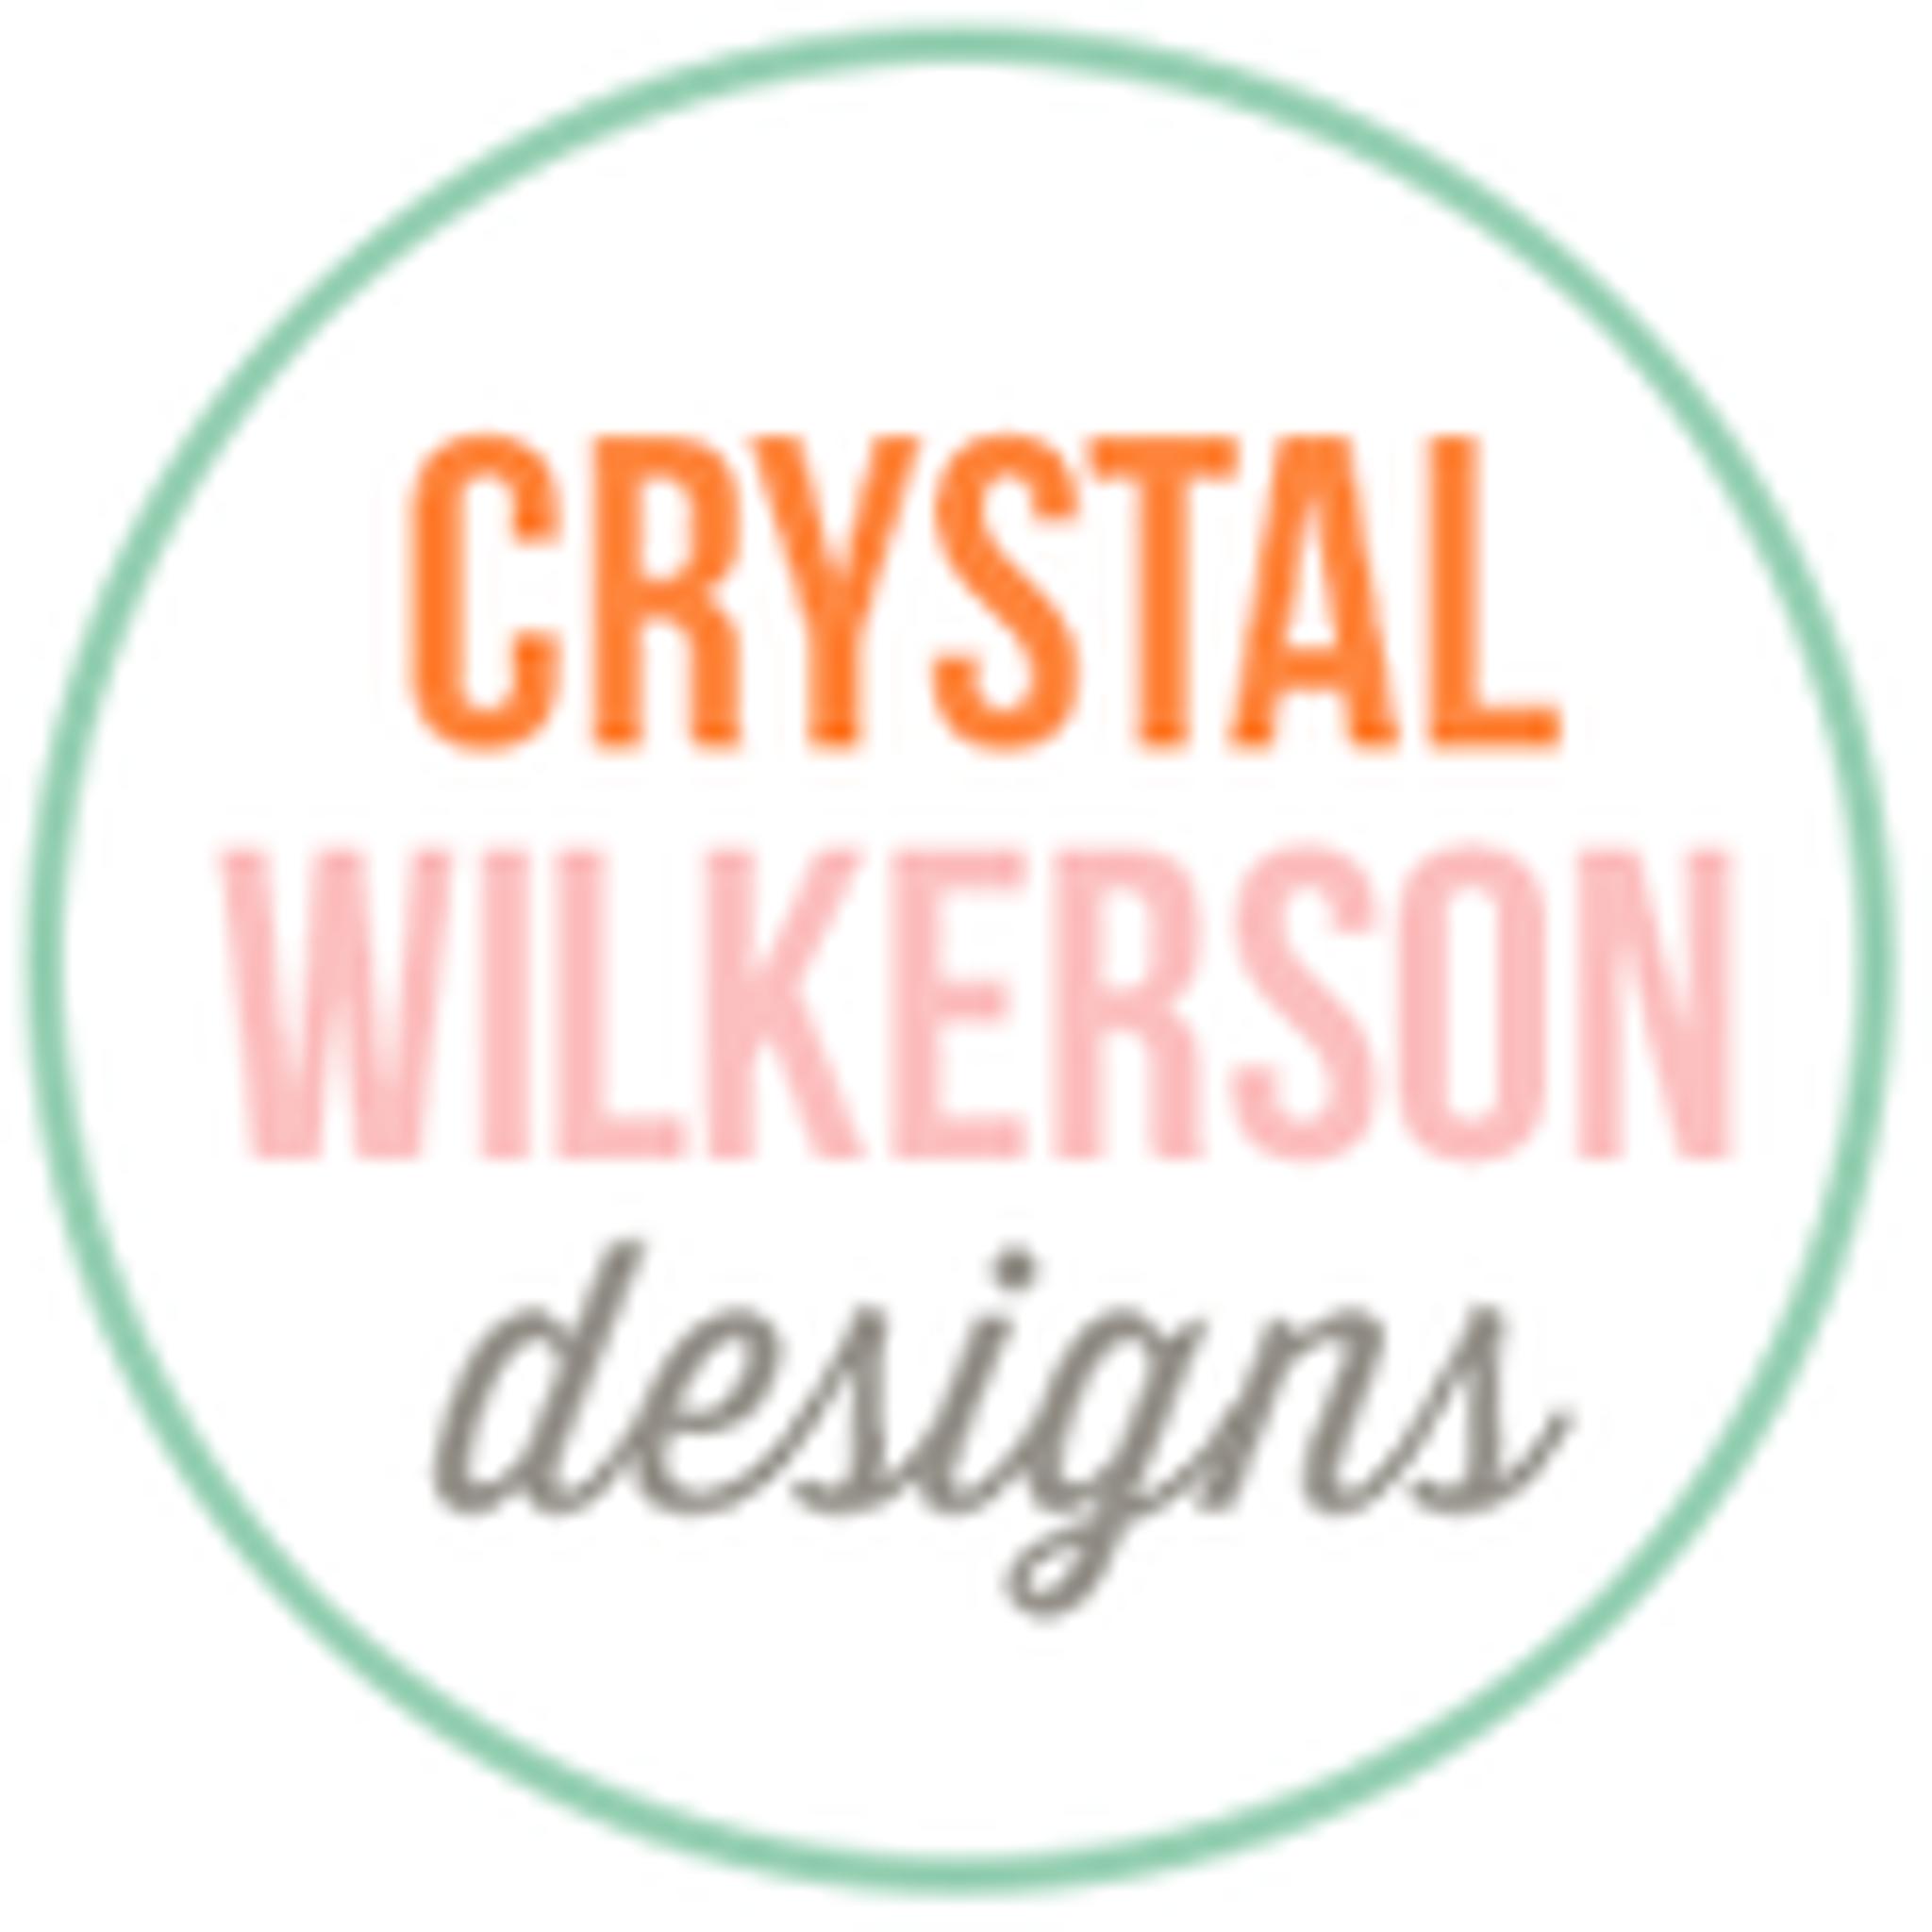 Crystal Wilkerson Designs